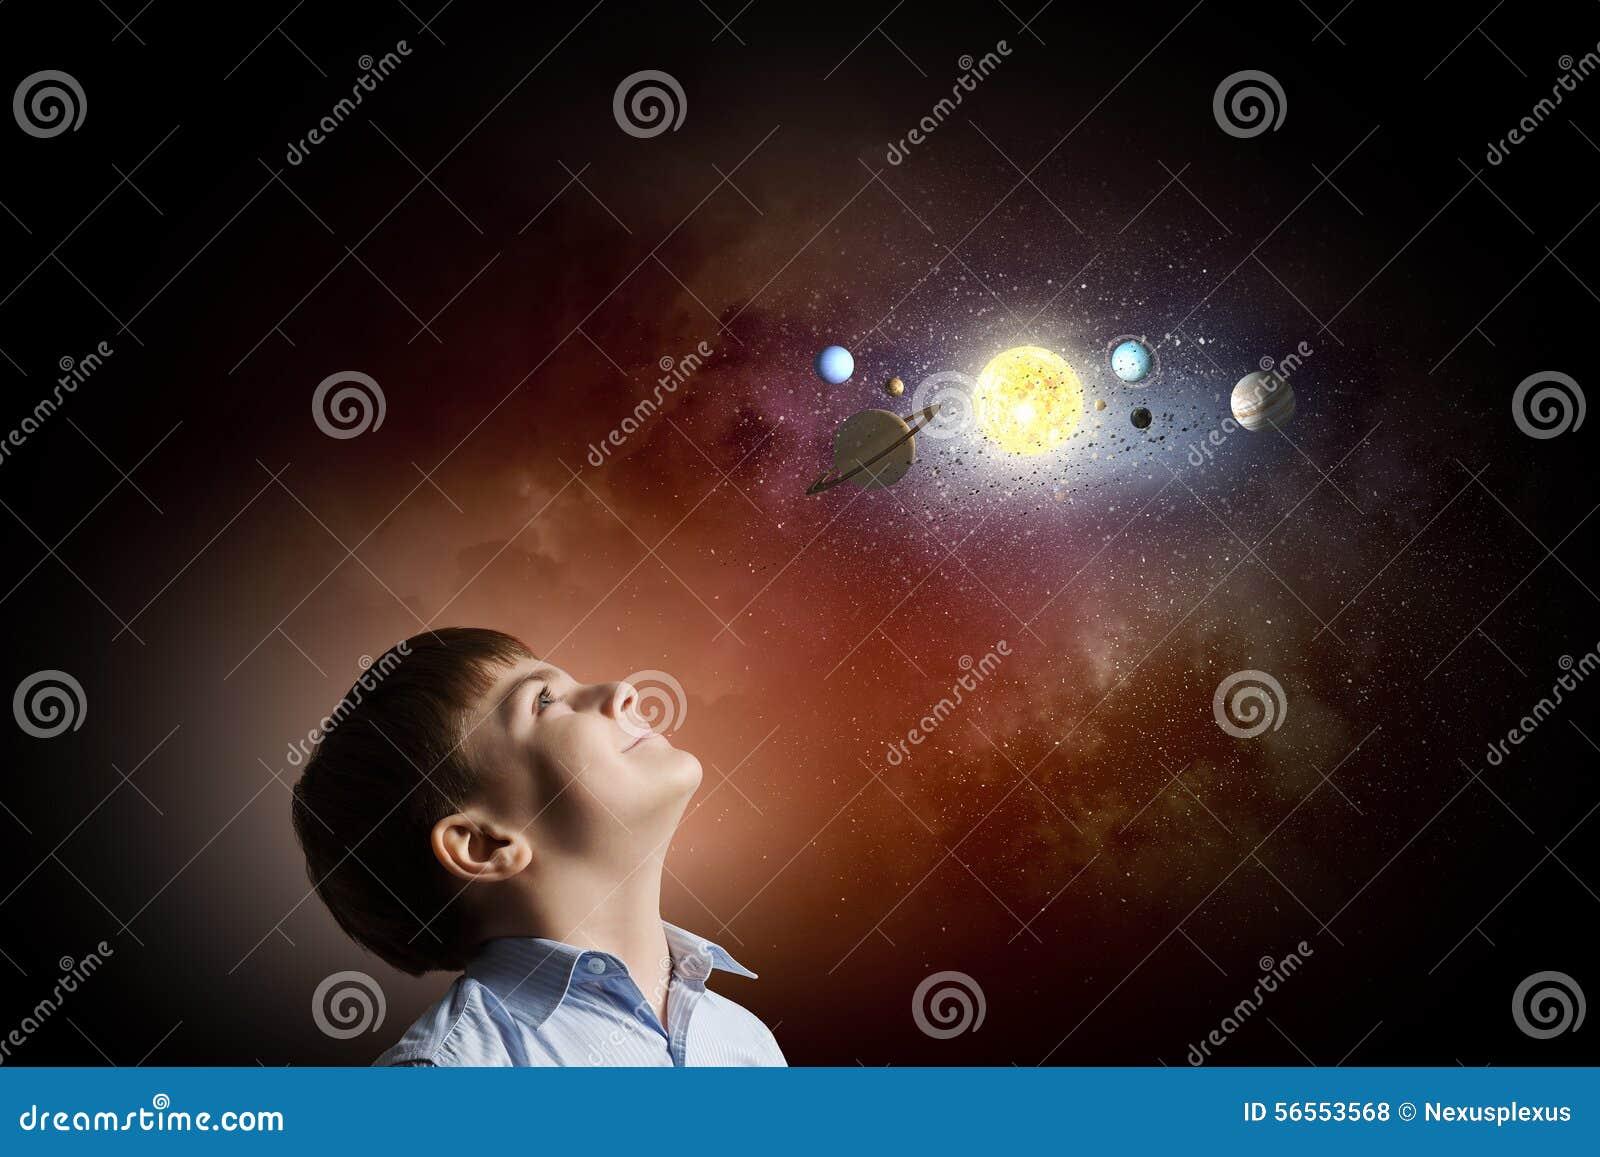 Download Θα είμαι αστροναύτης στοκ εικόνες. εικόνα από μυστήριο - 56553568